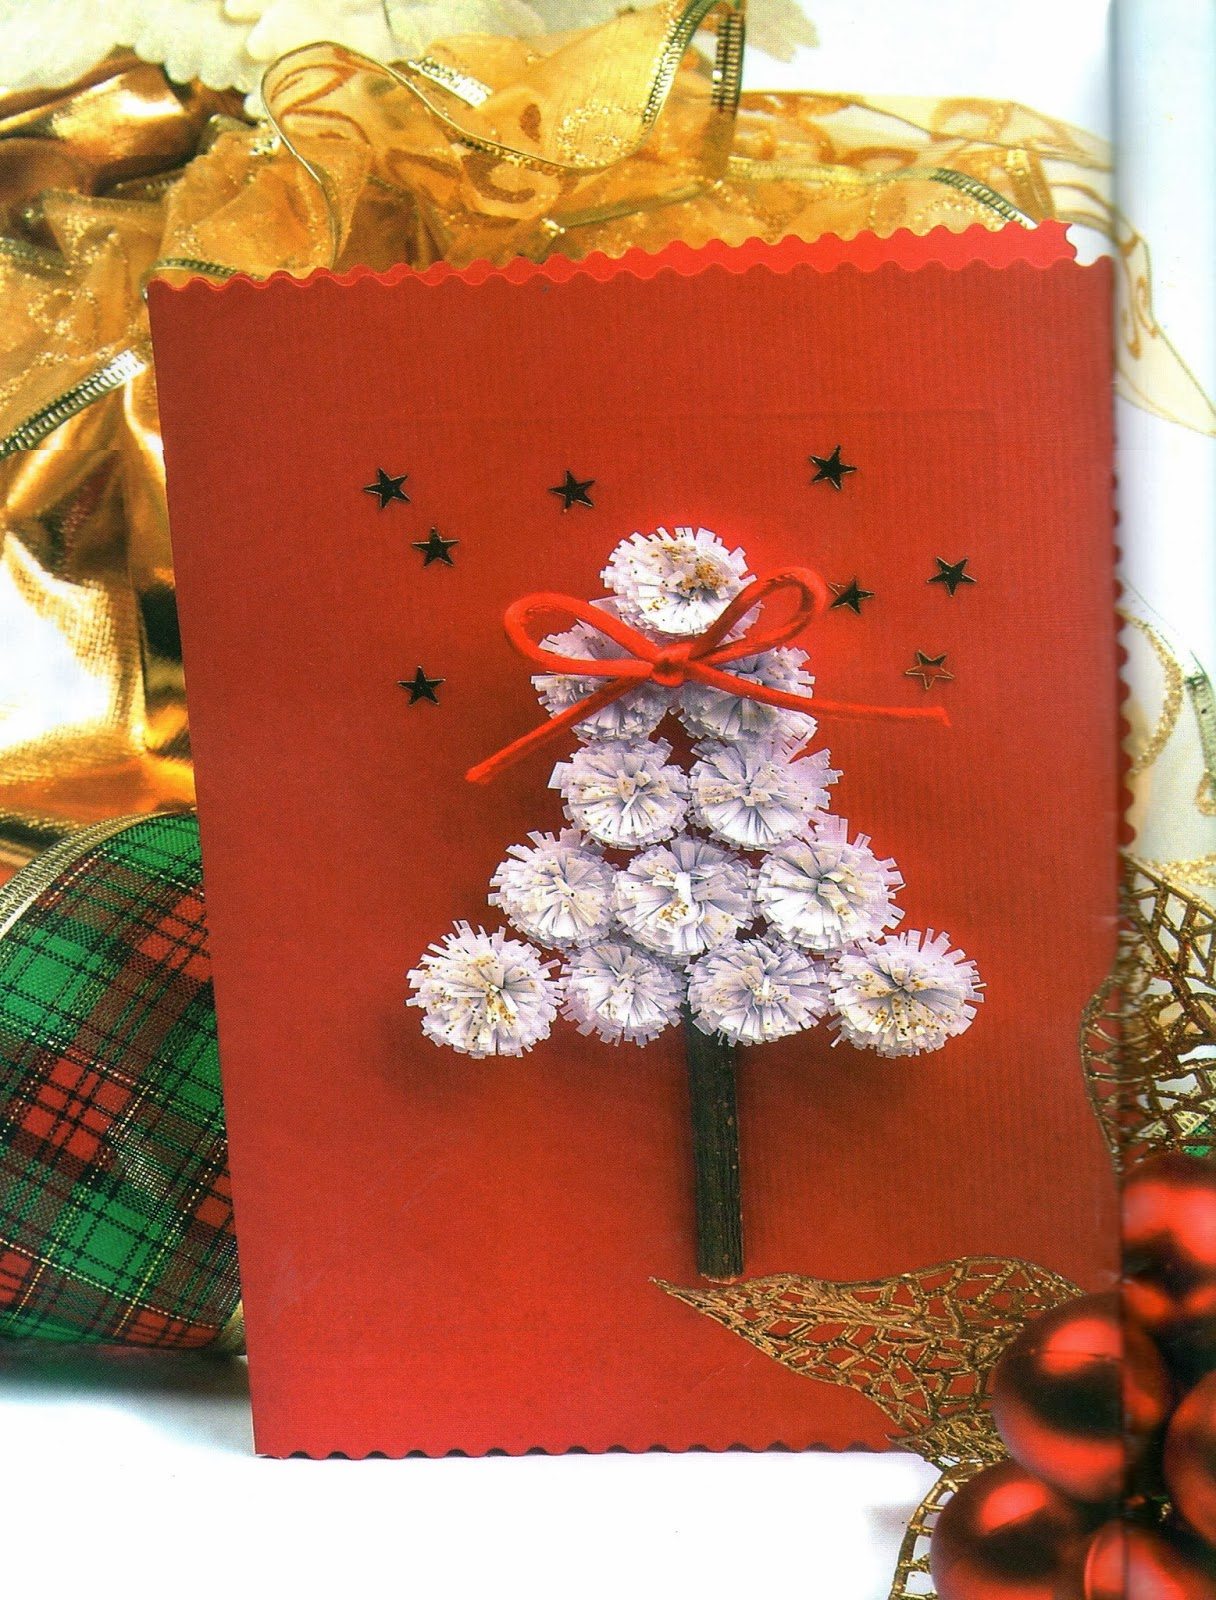 tarjeta navidea materiales tiras de papel arco iris de cm de ancho por cm de largo cartulinas para tarjetas aguja punta roma